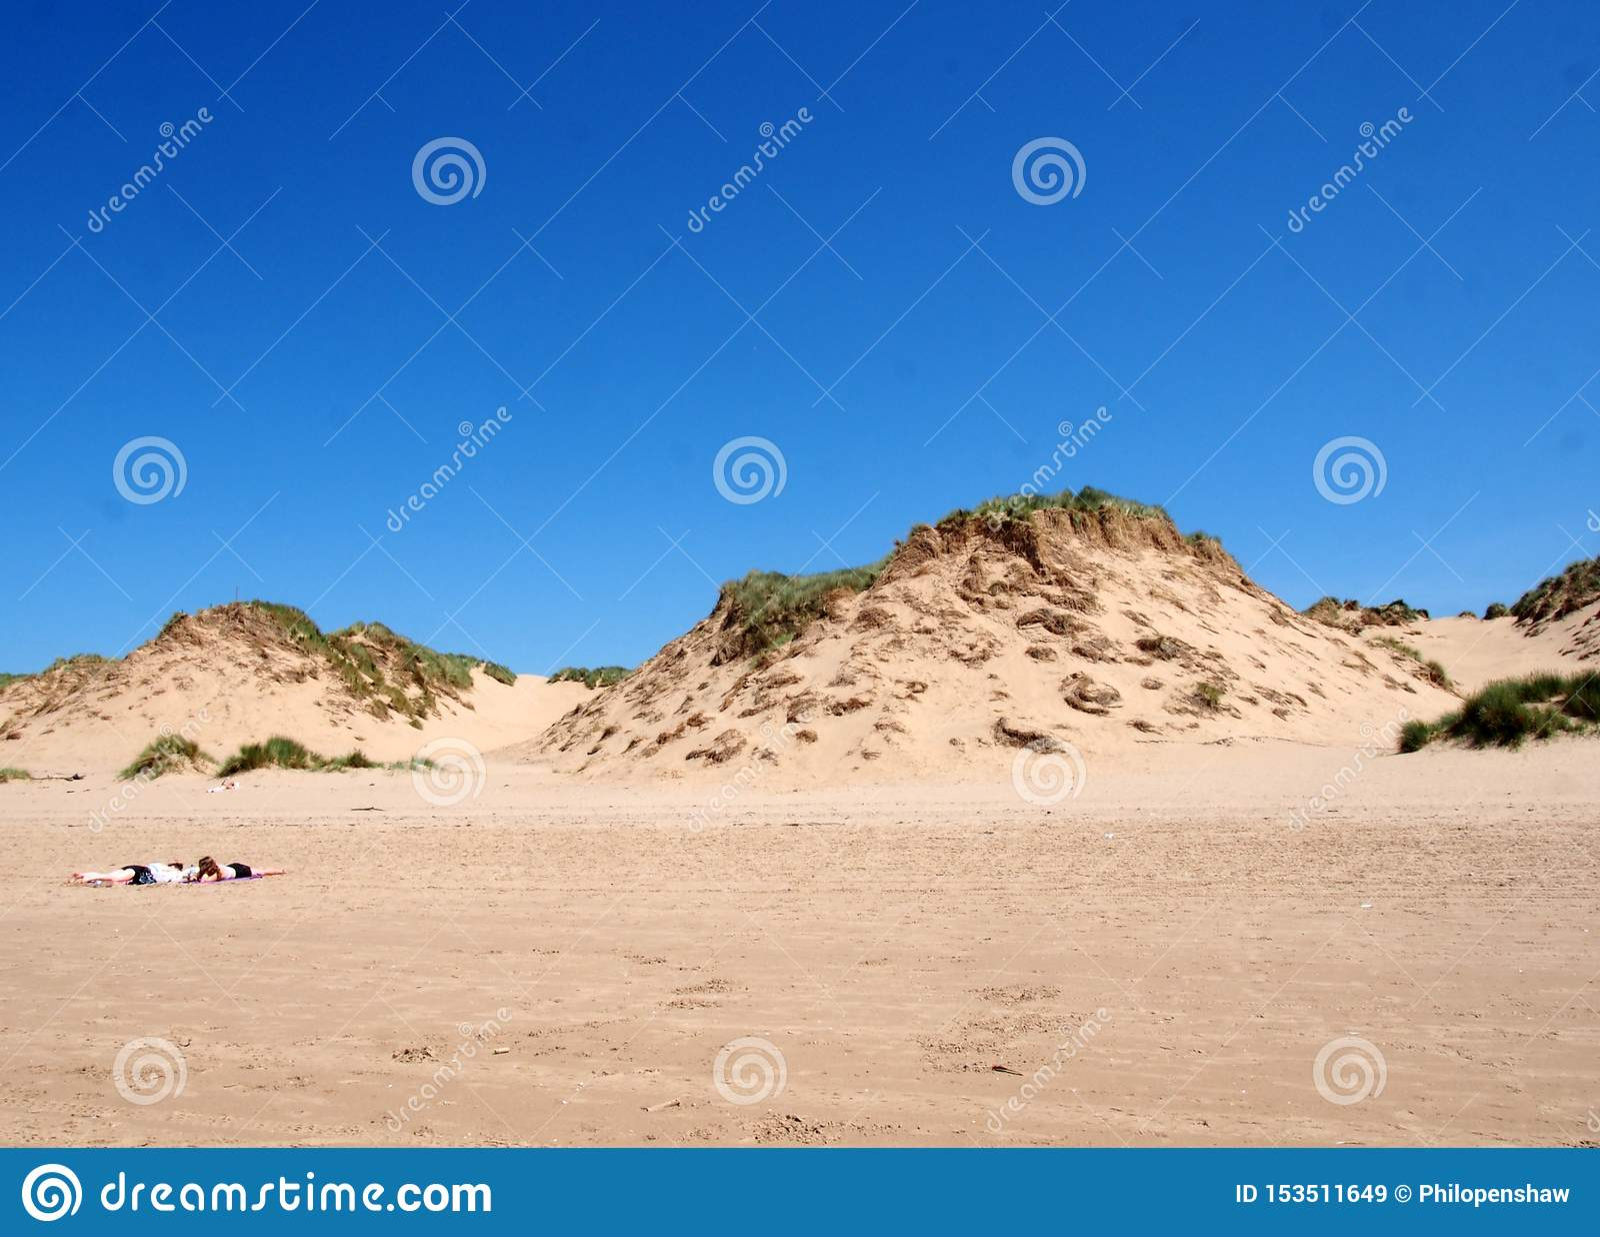 Two Women Doing Cartwheels On The Beach In Slow Motion